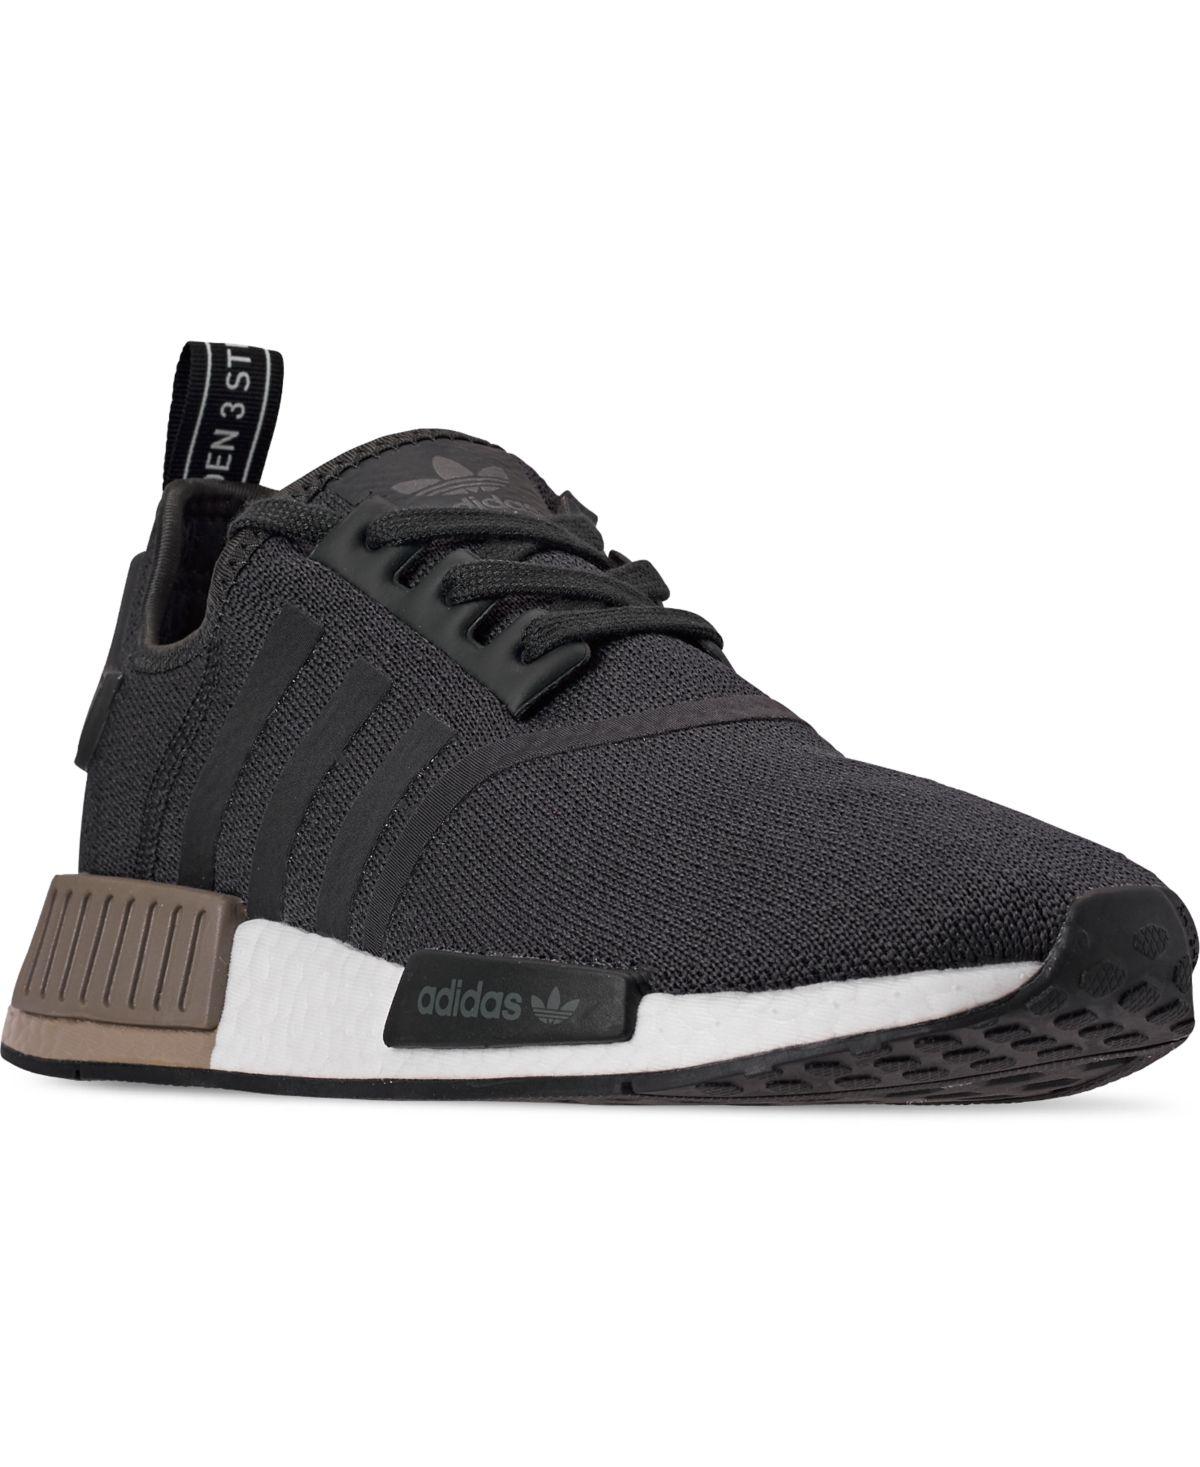 Good Men and Women Adidas Originals NMD R1 Core Black White Sneaker